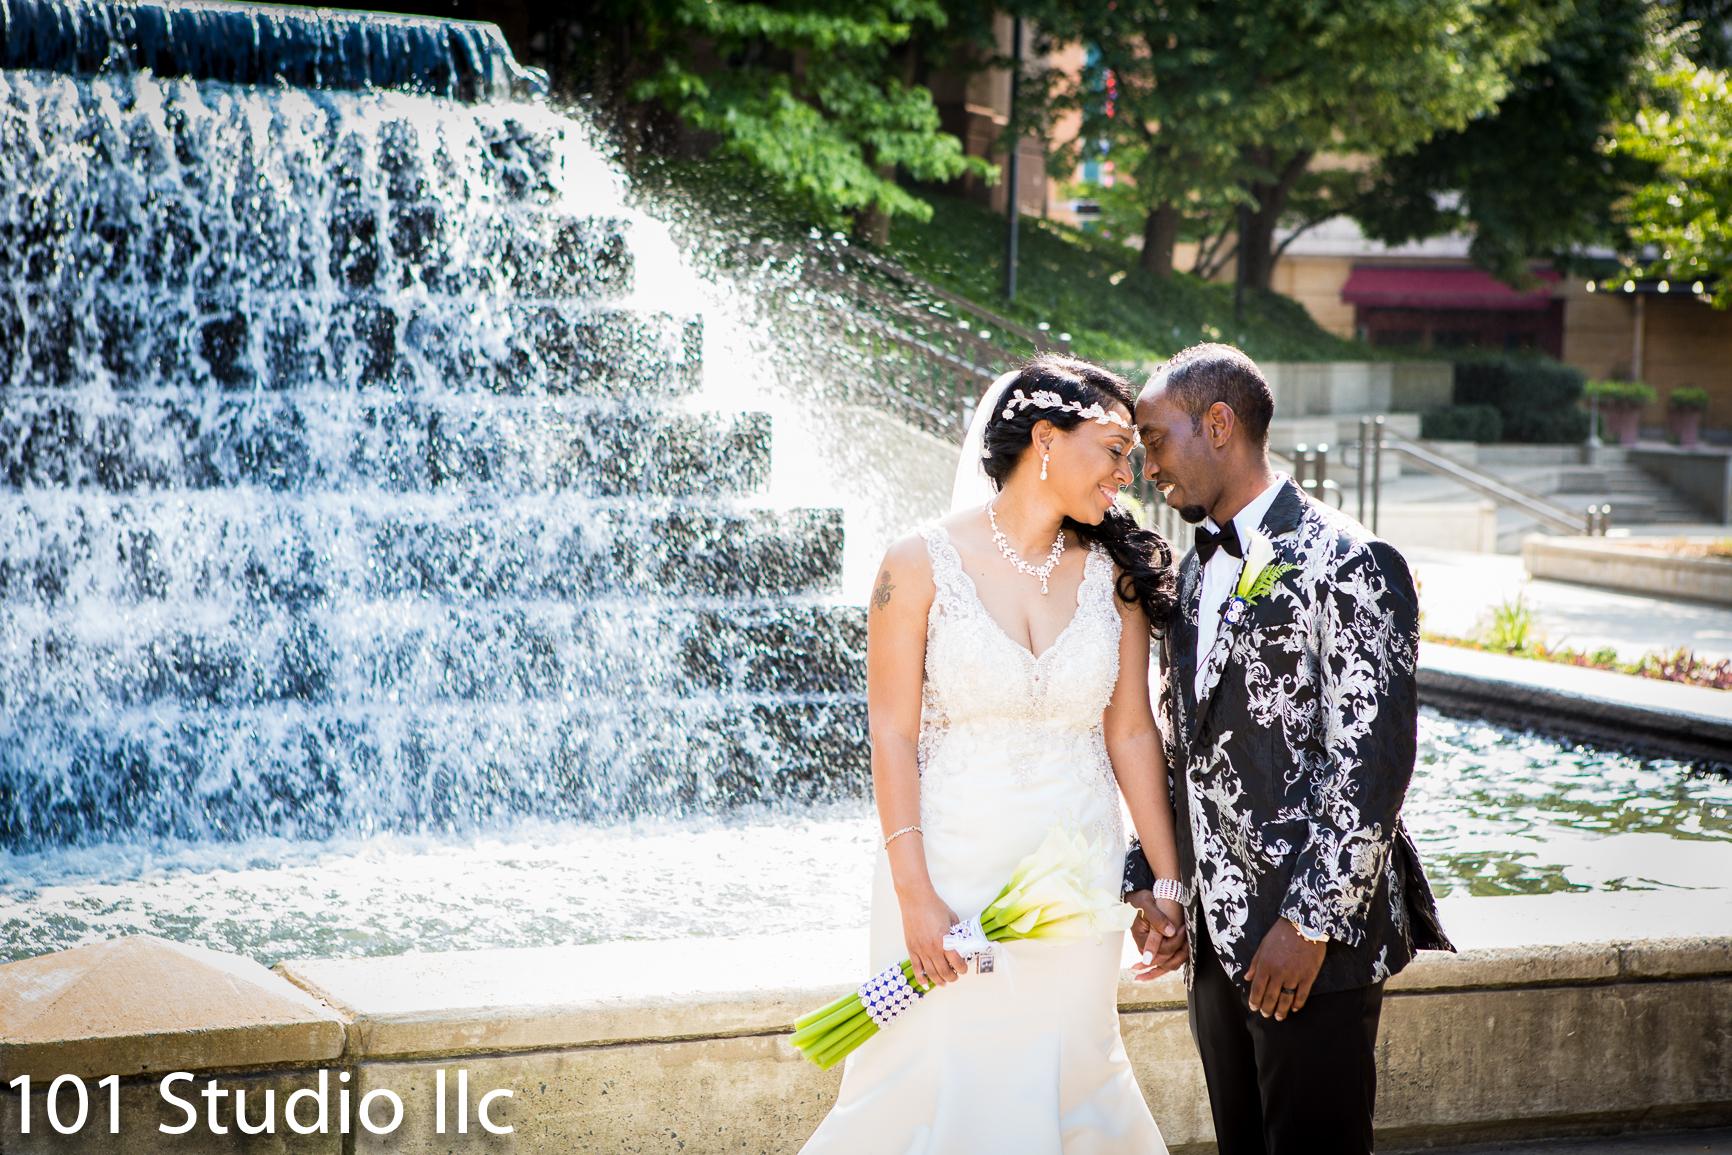 Raleigh  wedding photographer - 101 Studio llc -10.jpg